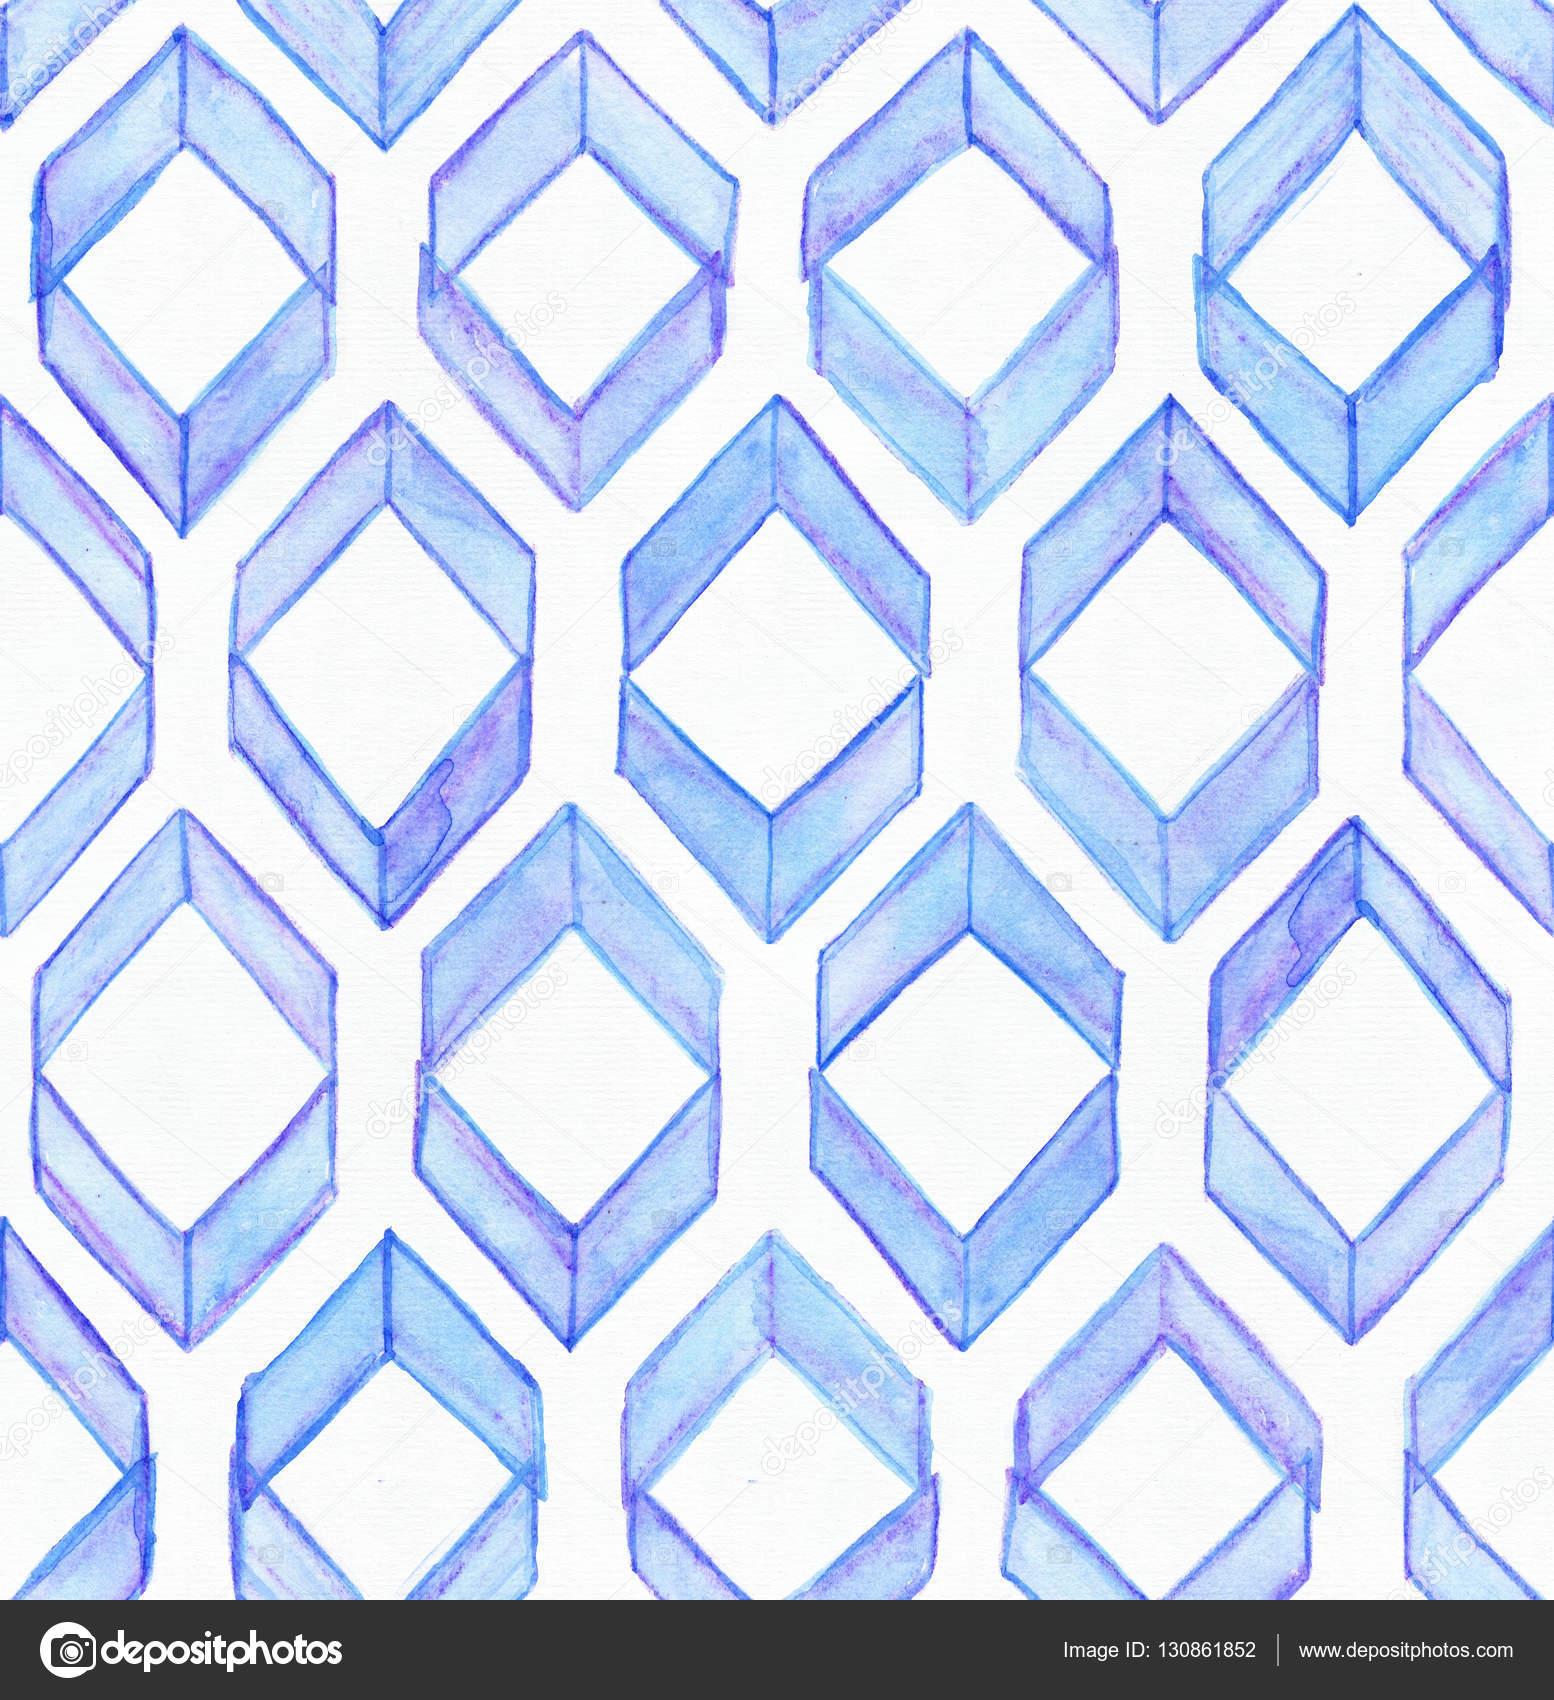 Текстура голубая ткань